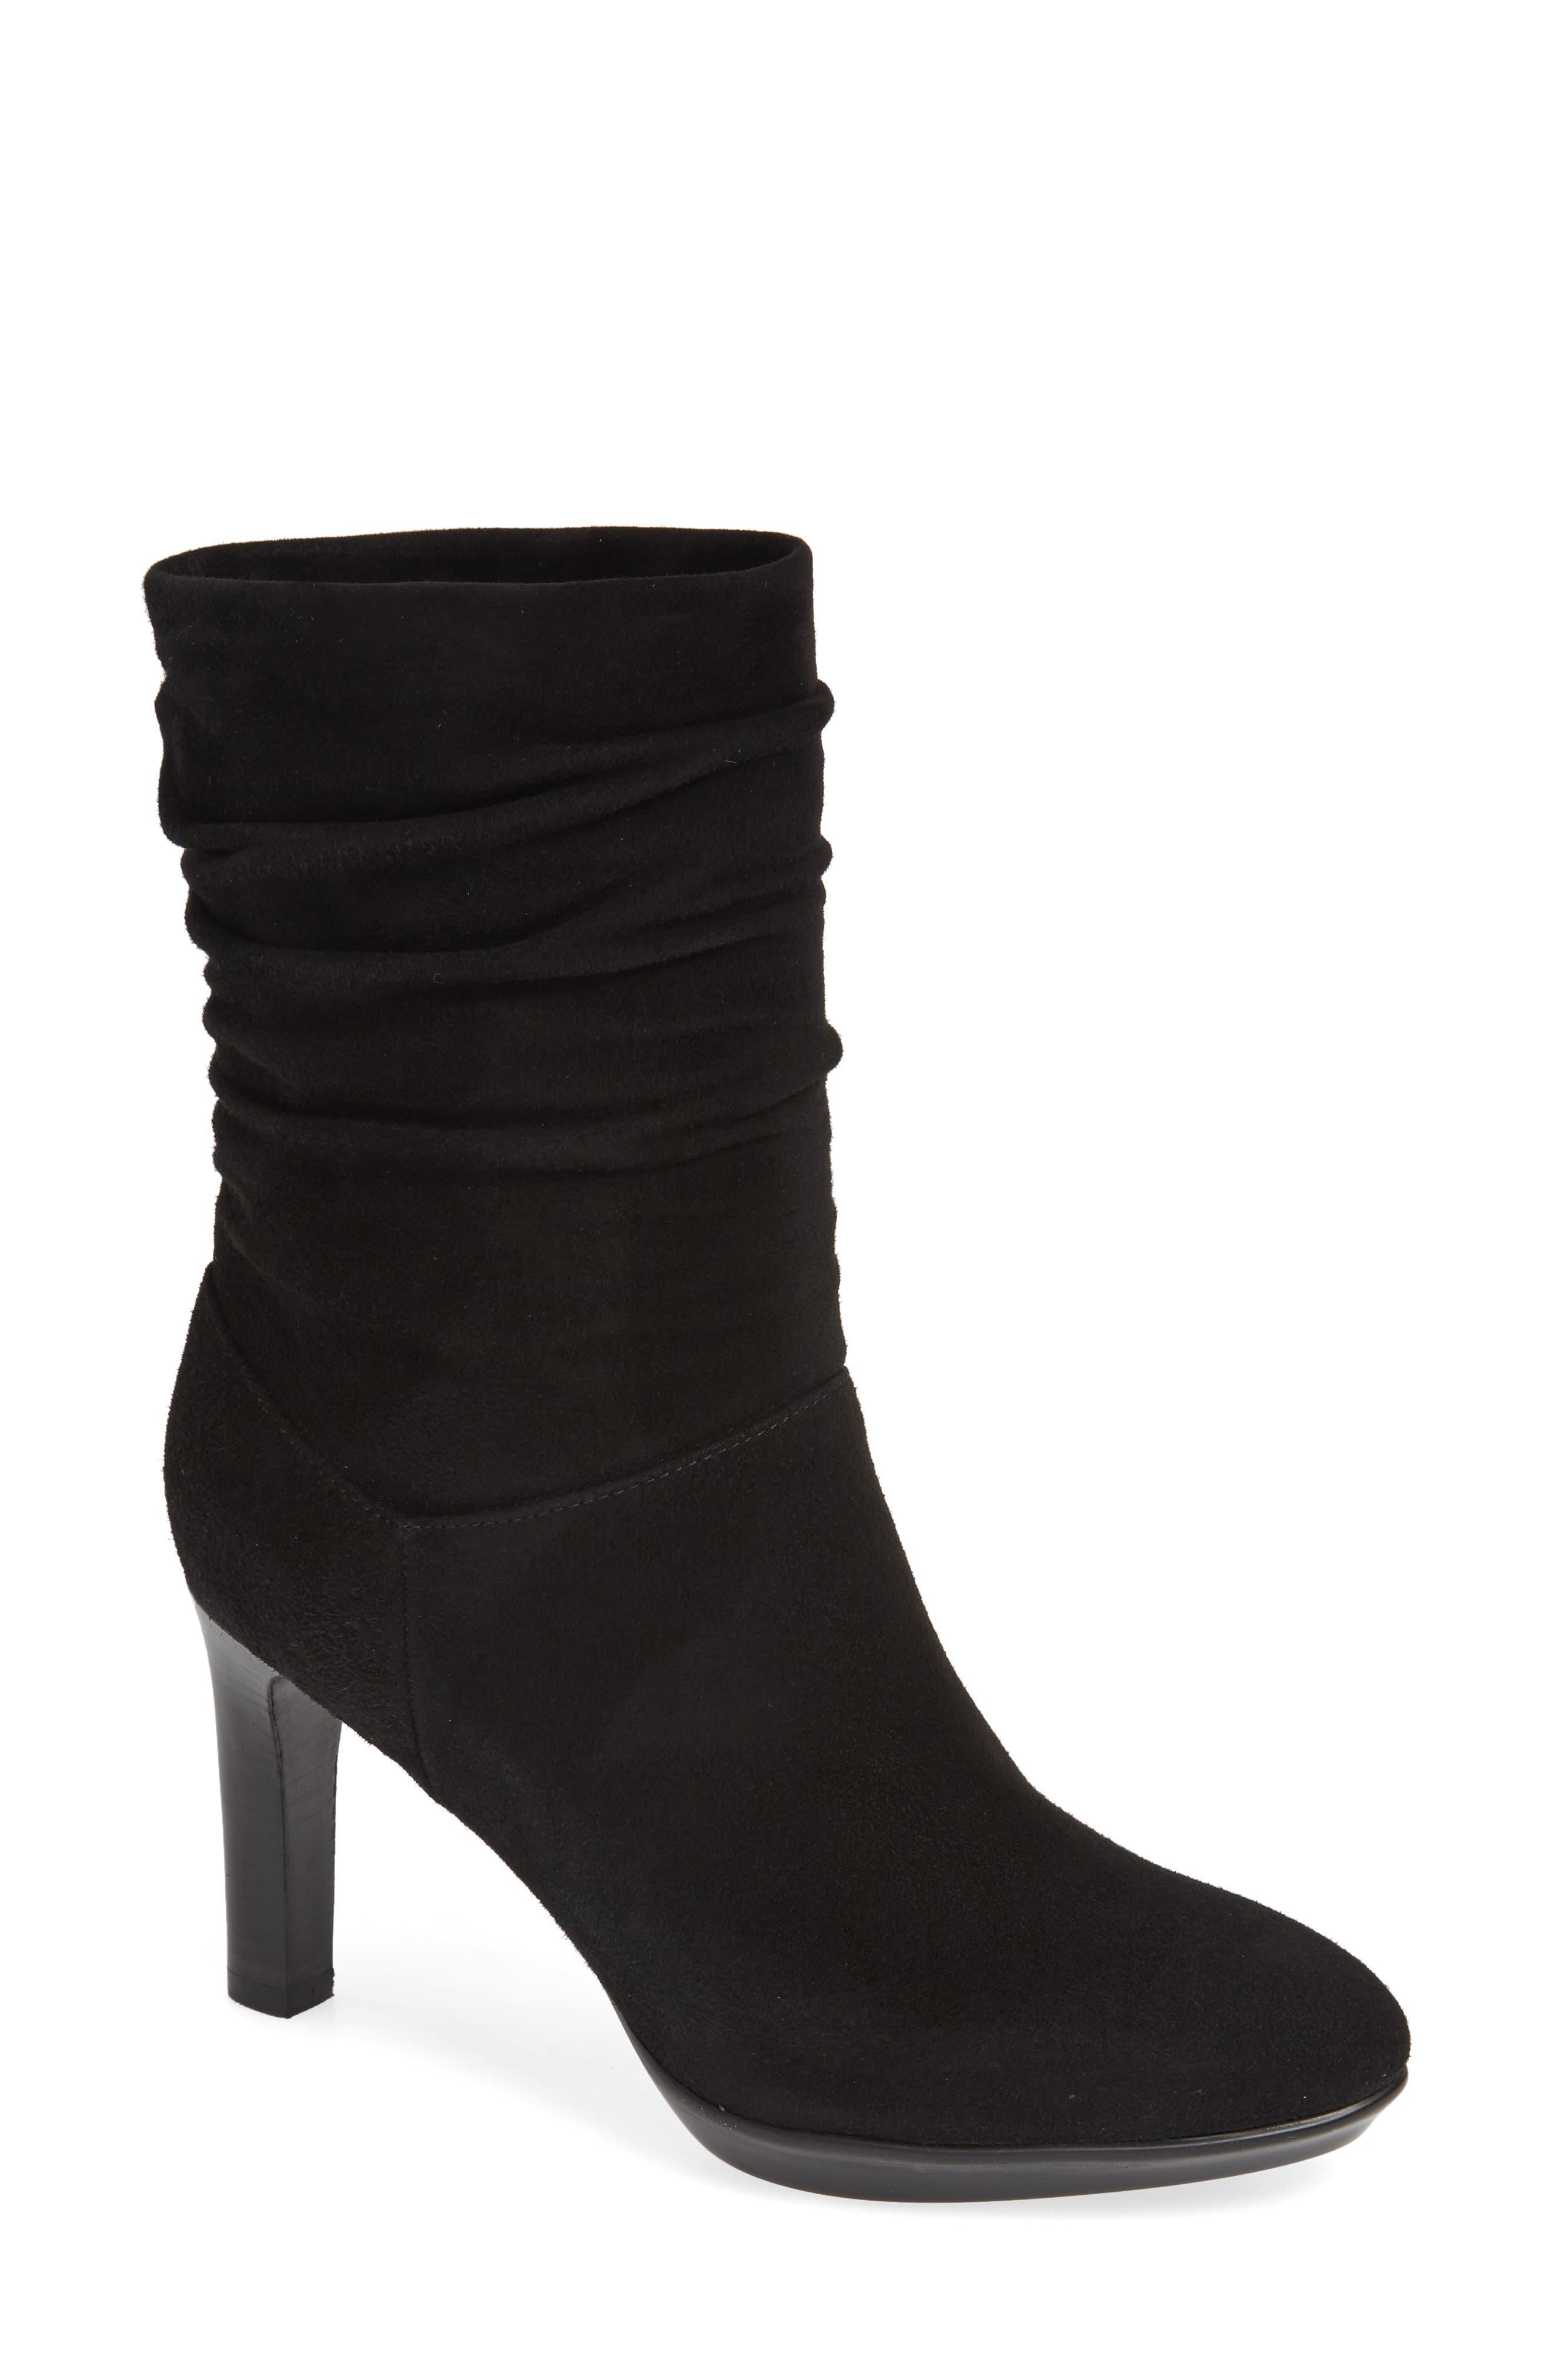 Aquatalia Raegan Weatherproof Boot, Black